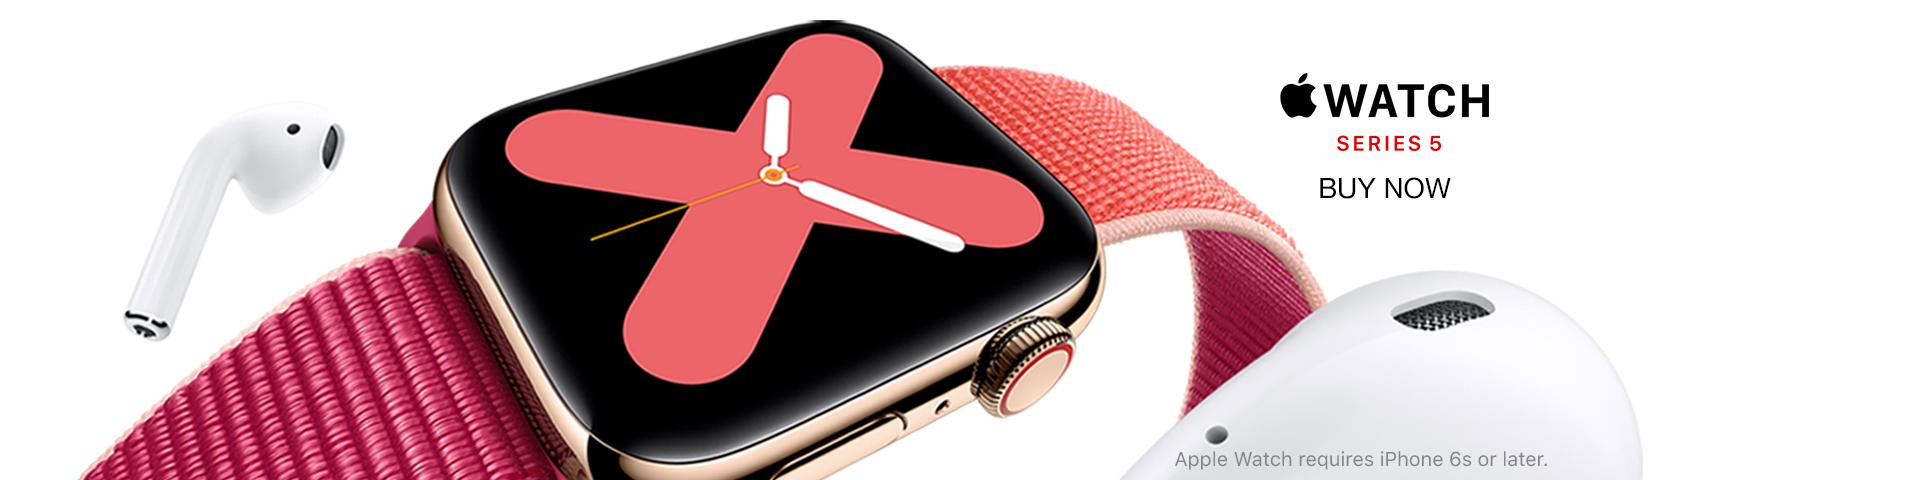 IMG Brands Apple Watch banner buy now 2019 v3